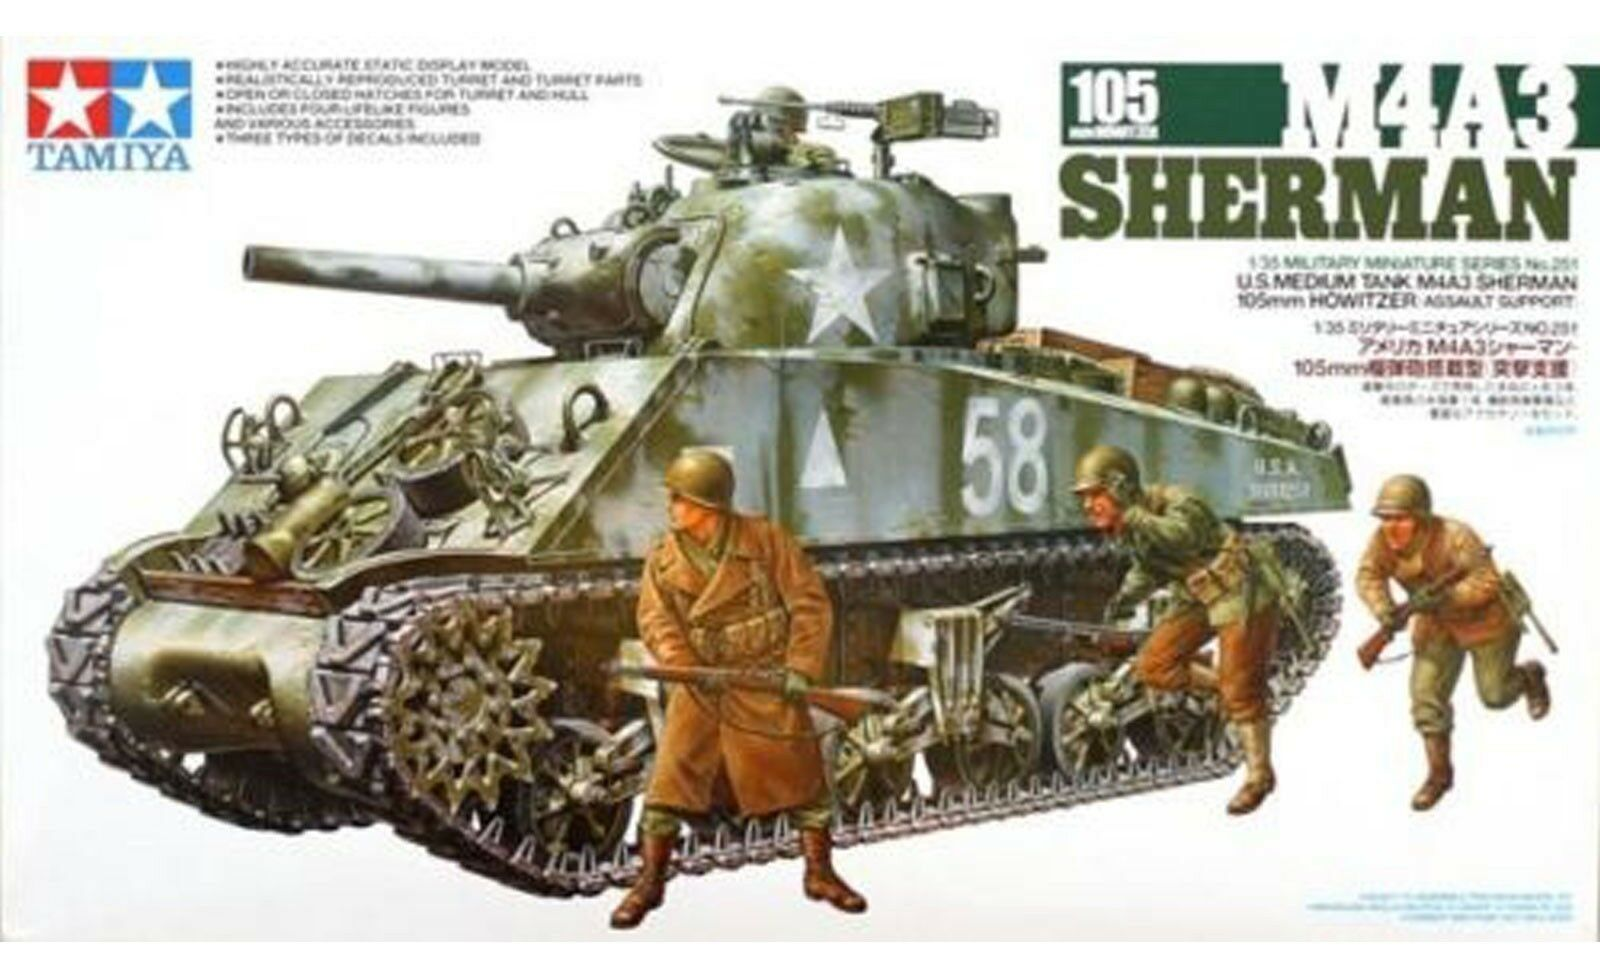 TAMIYA M4A3 SHERMAN W 105MM HOWITZER 1 35th scale